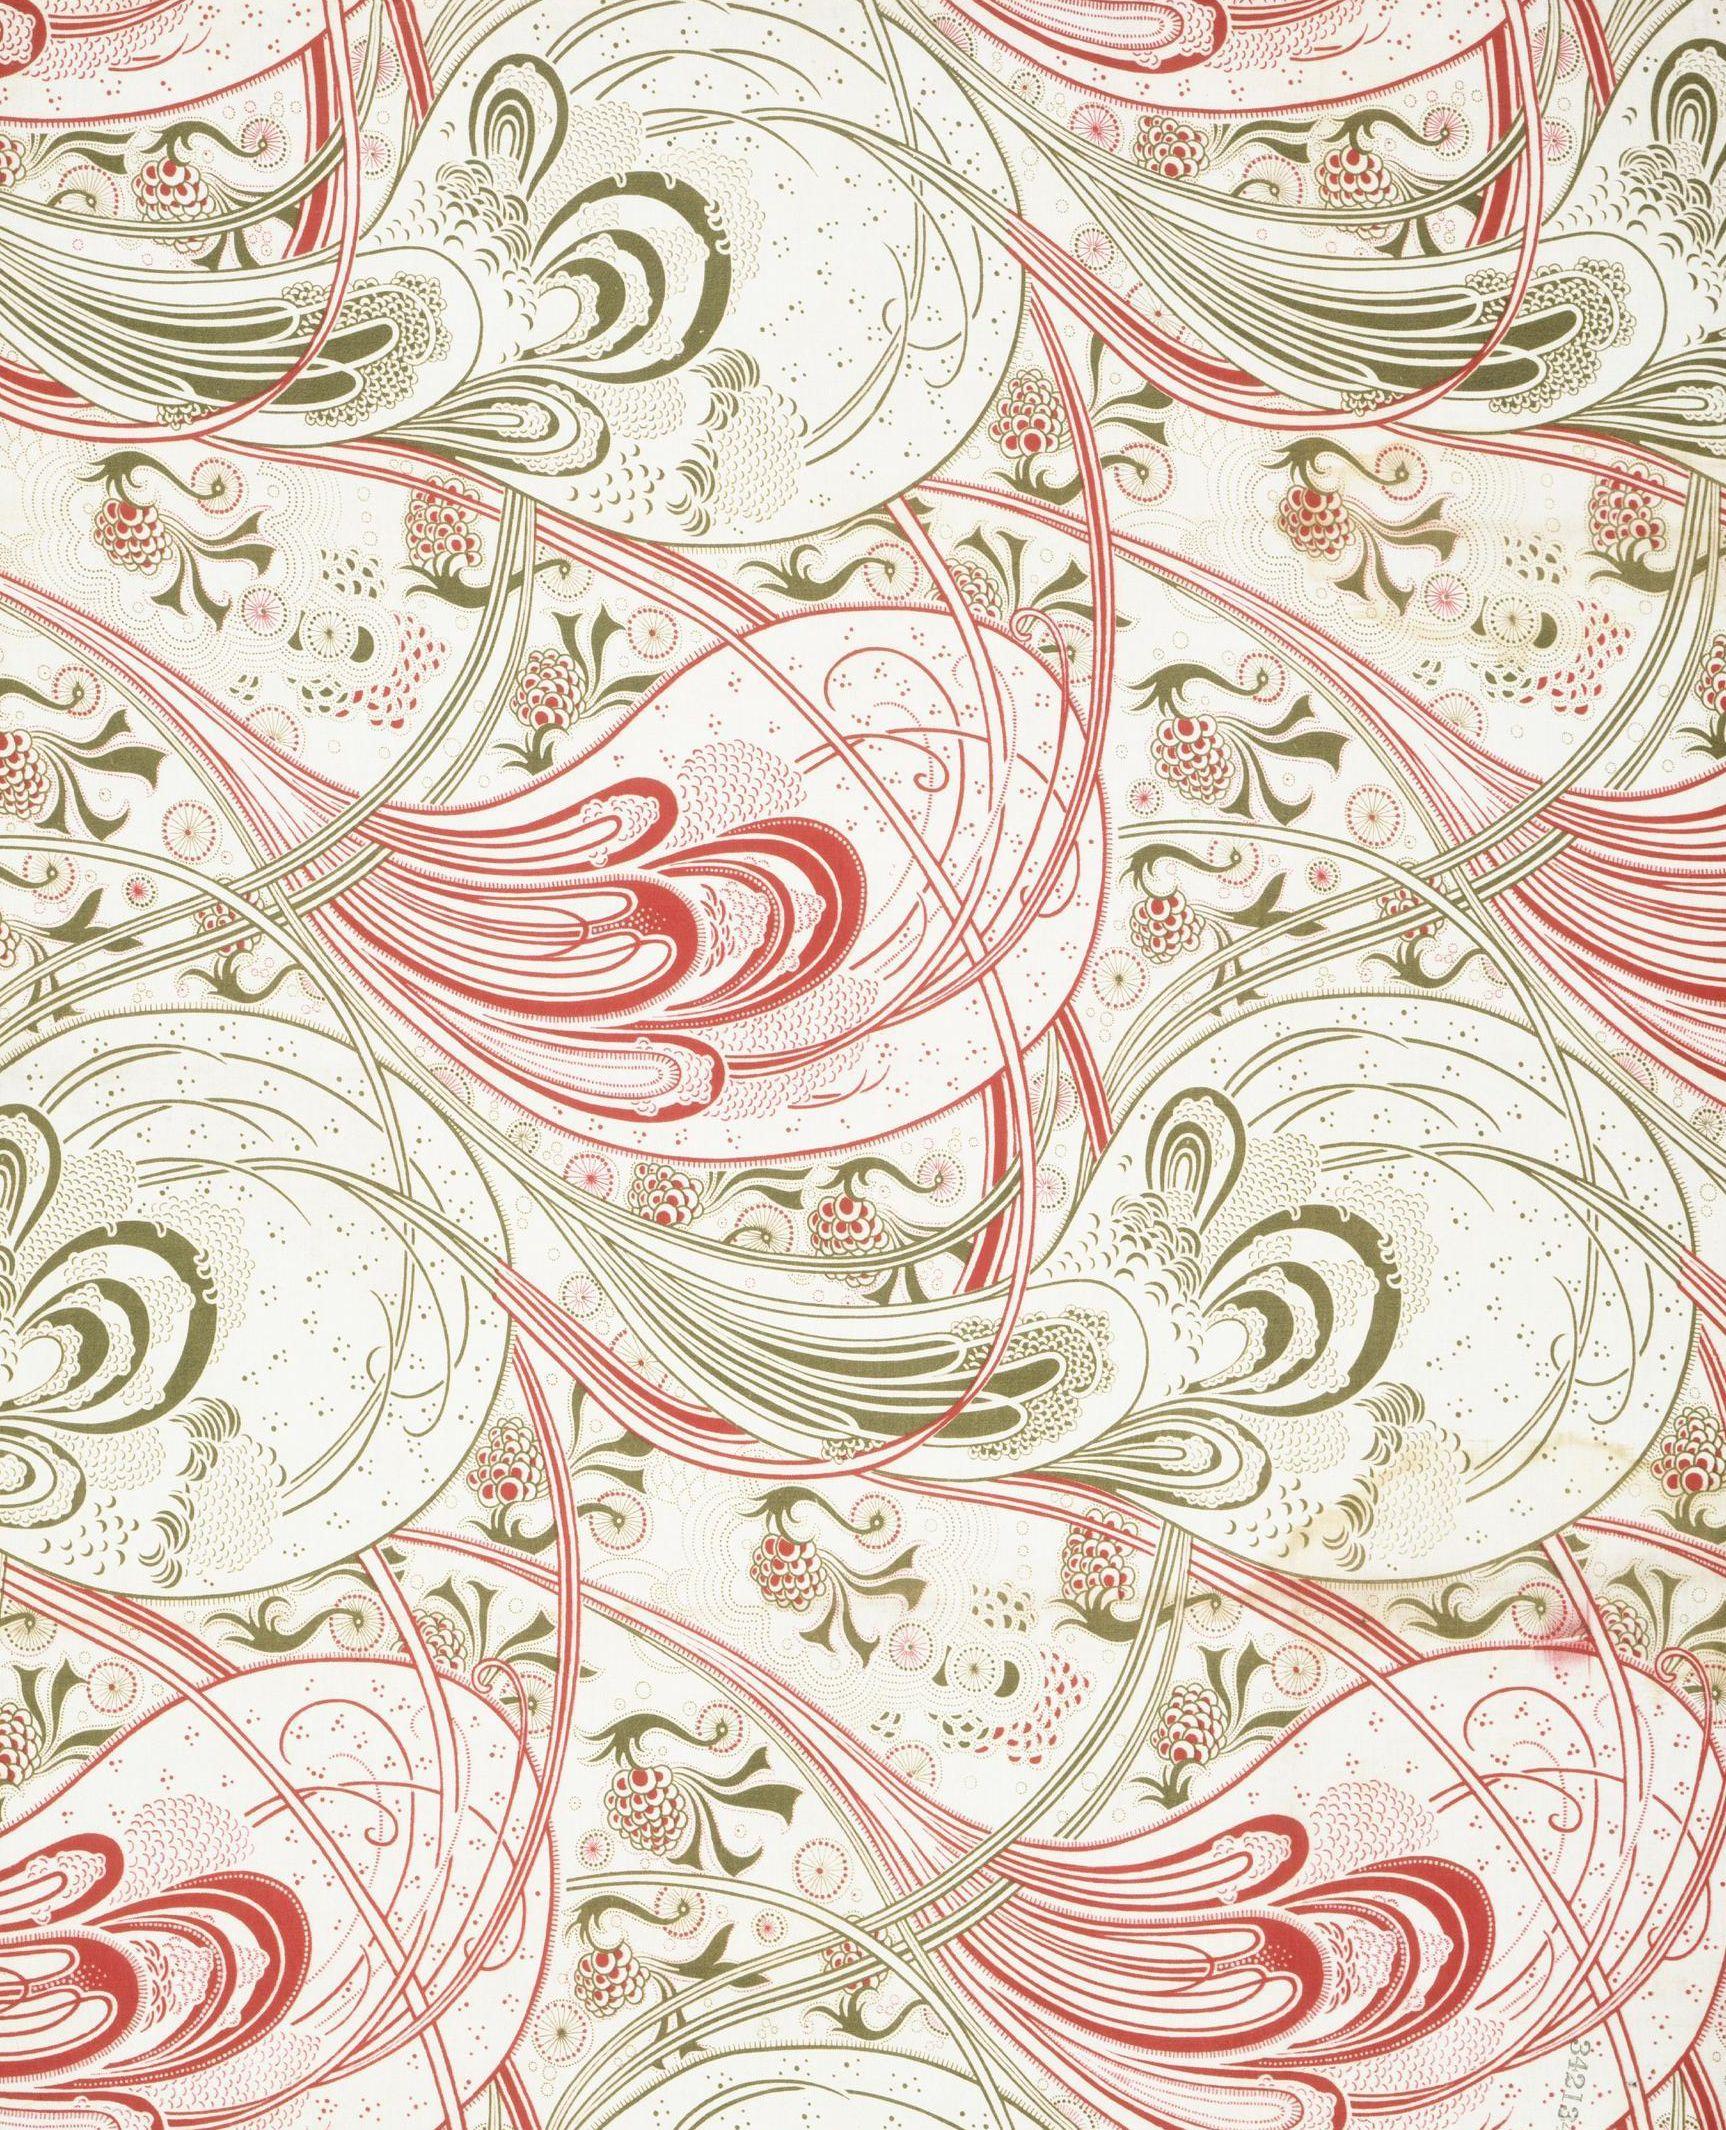 Christopher Dresser, furnishing fabric, 1899 (made)